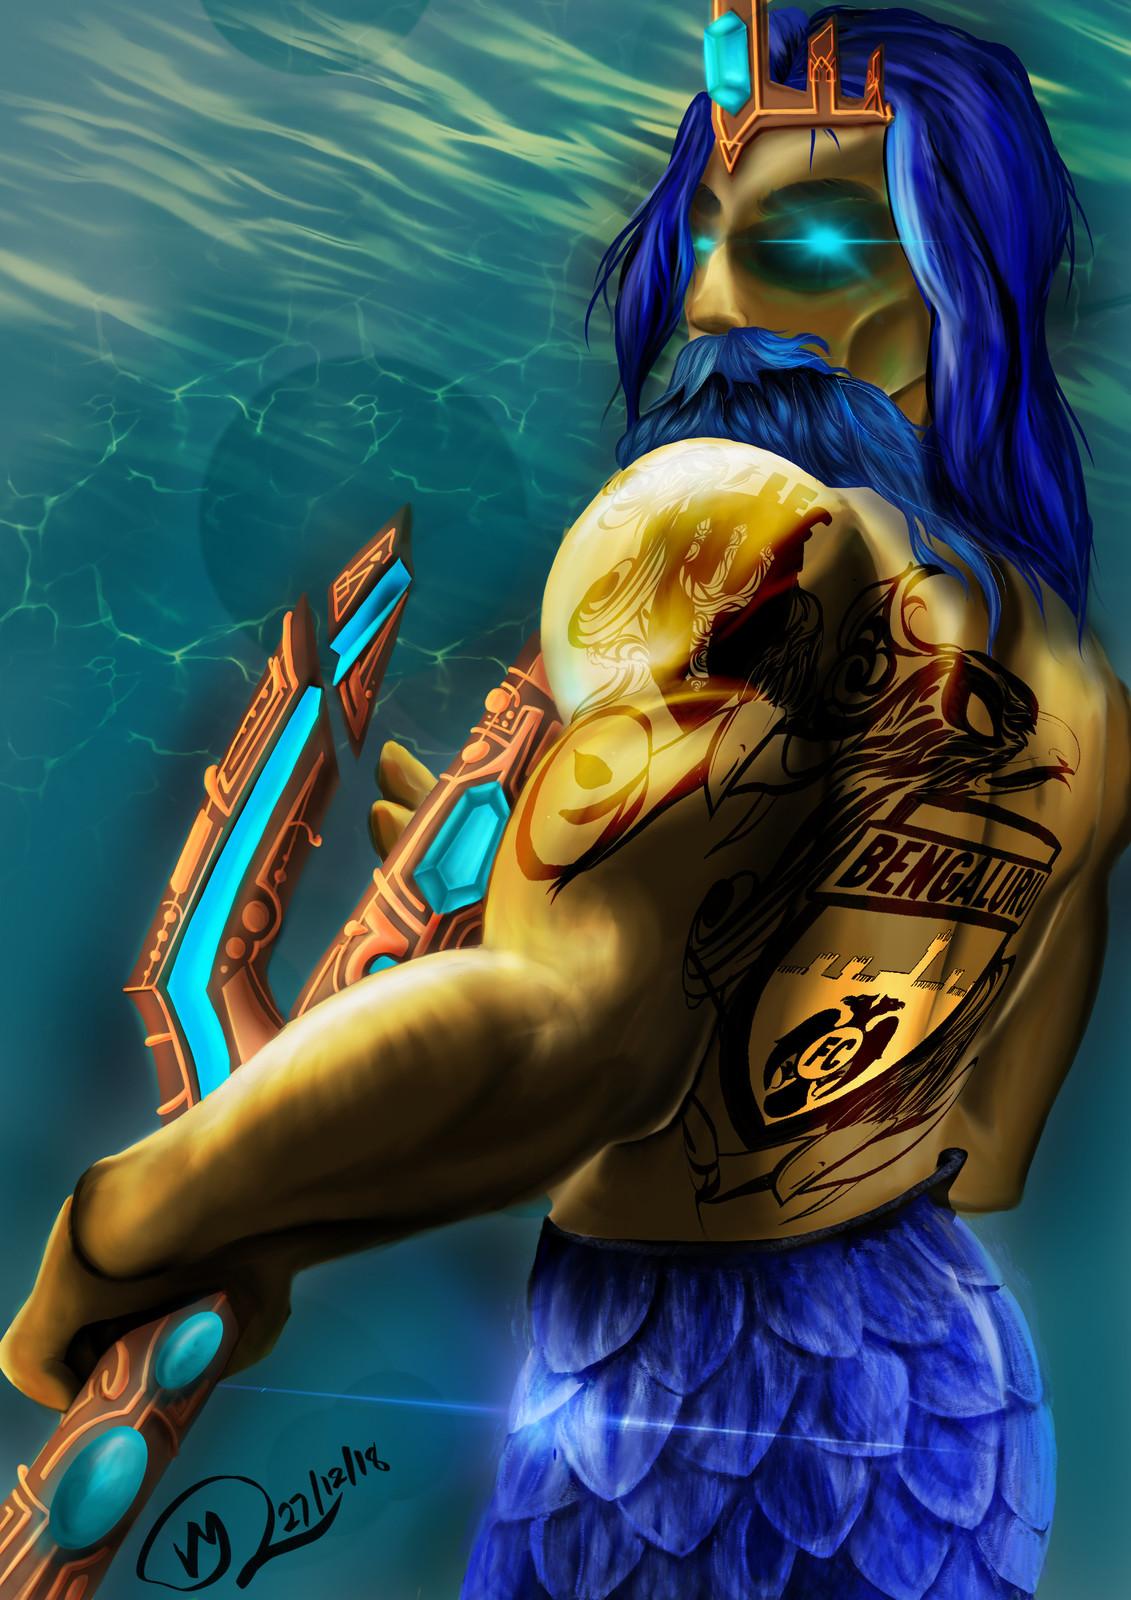 Poseidon, the concept art